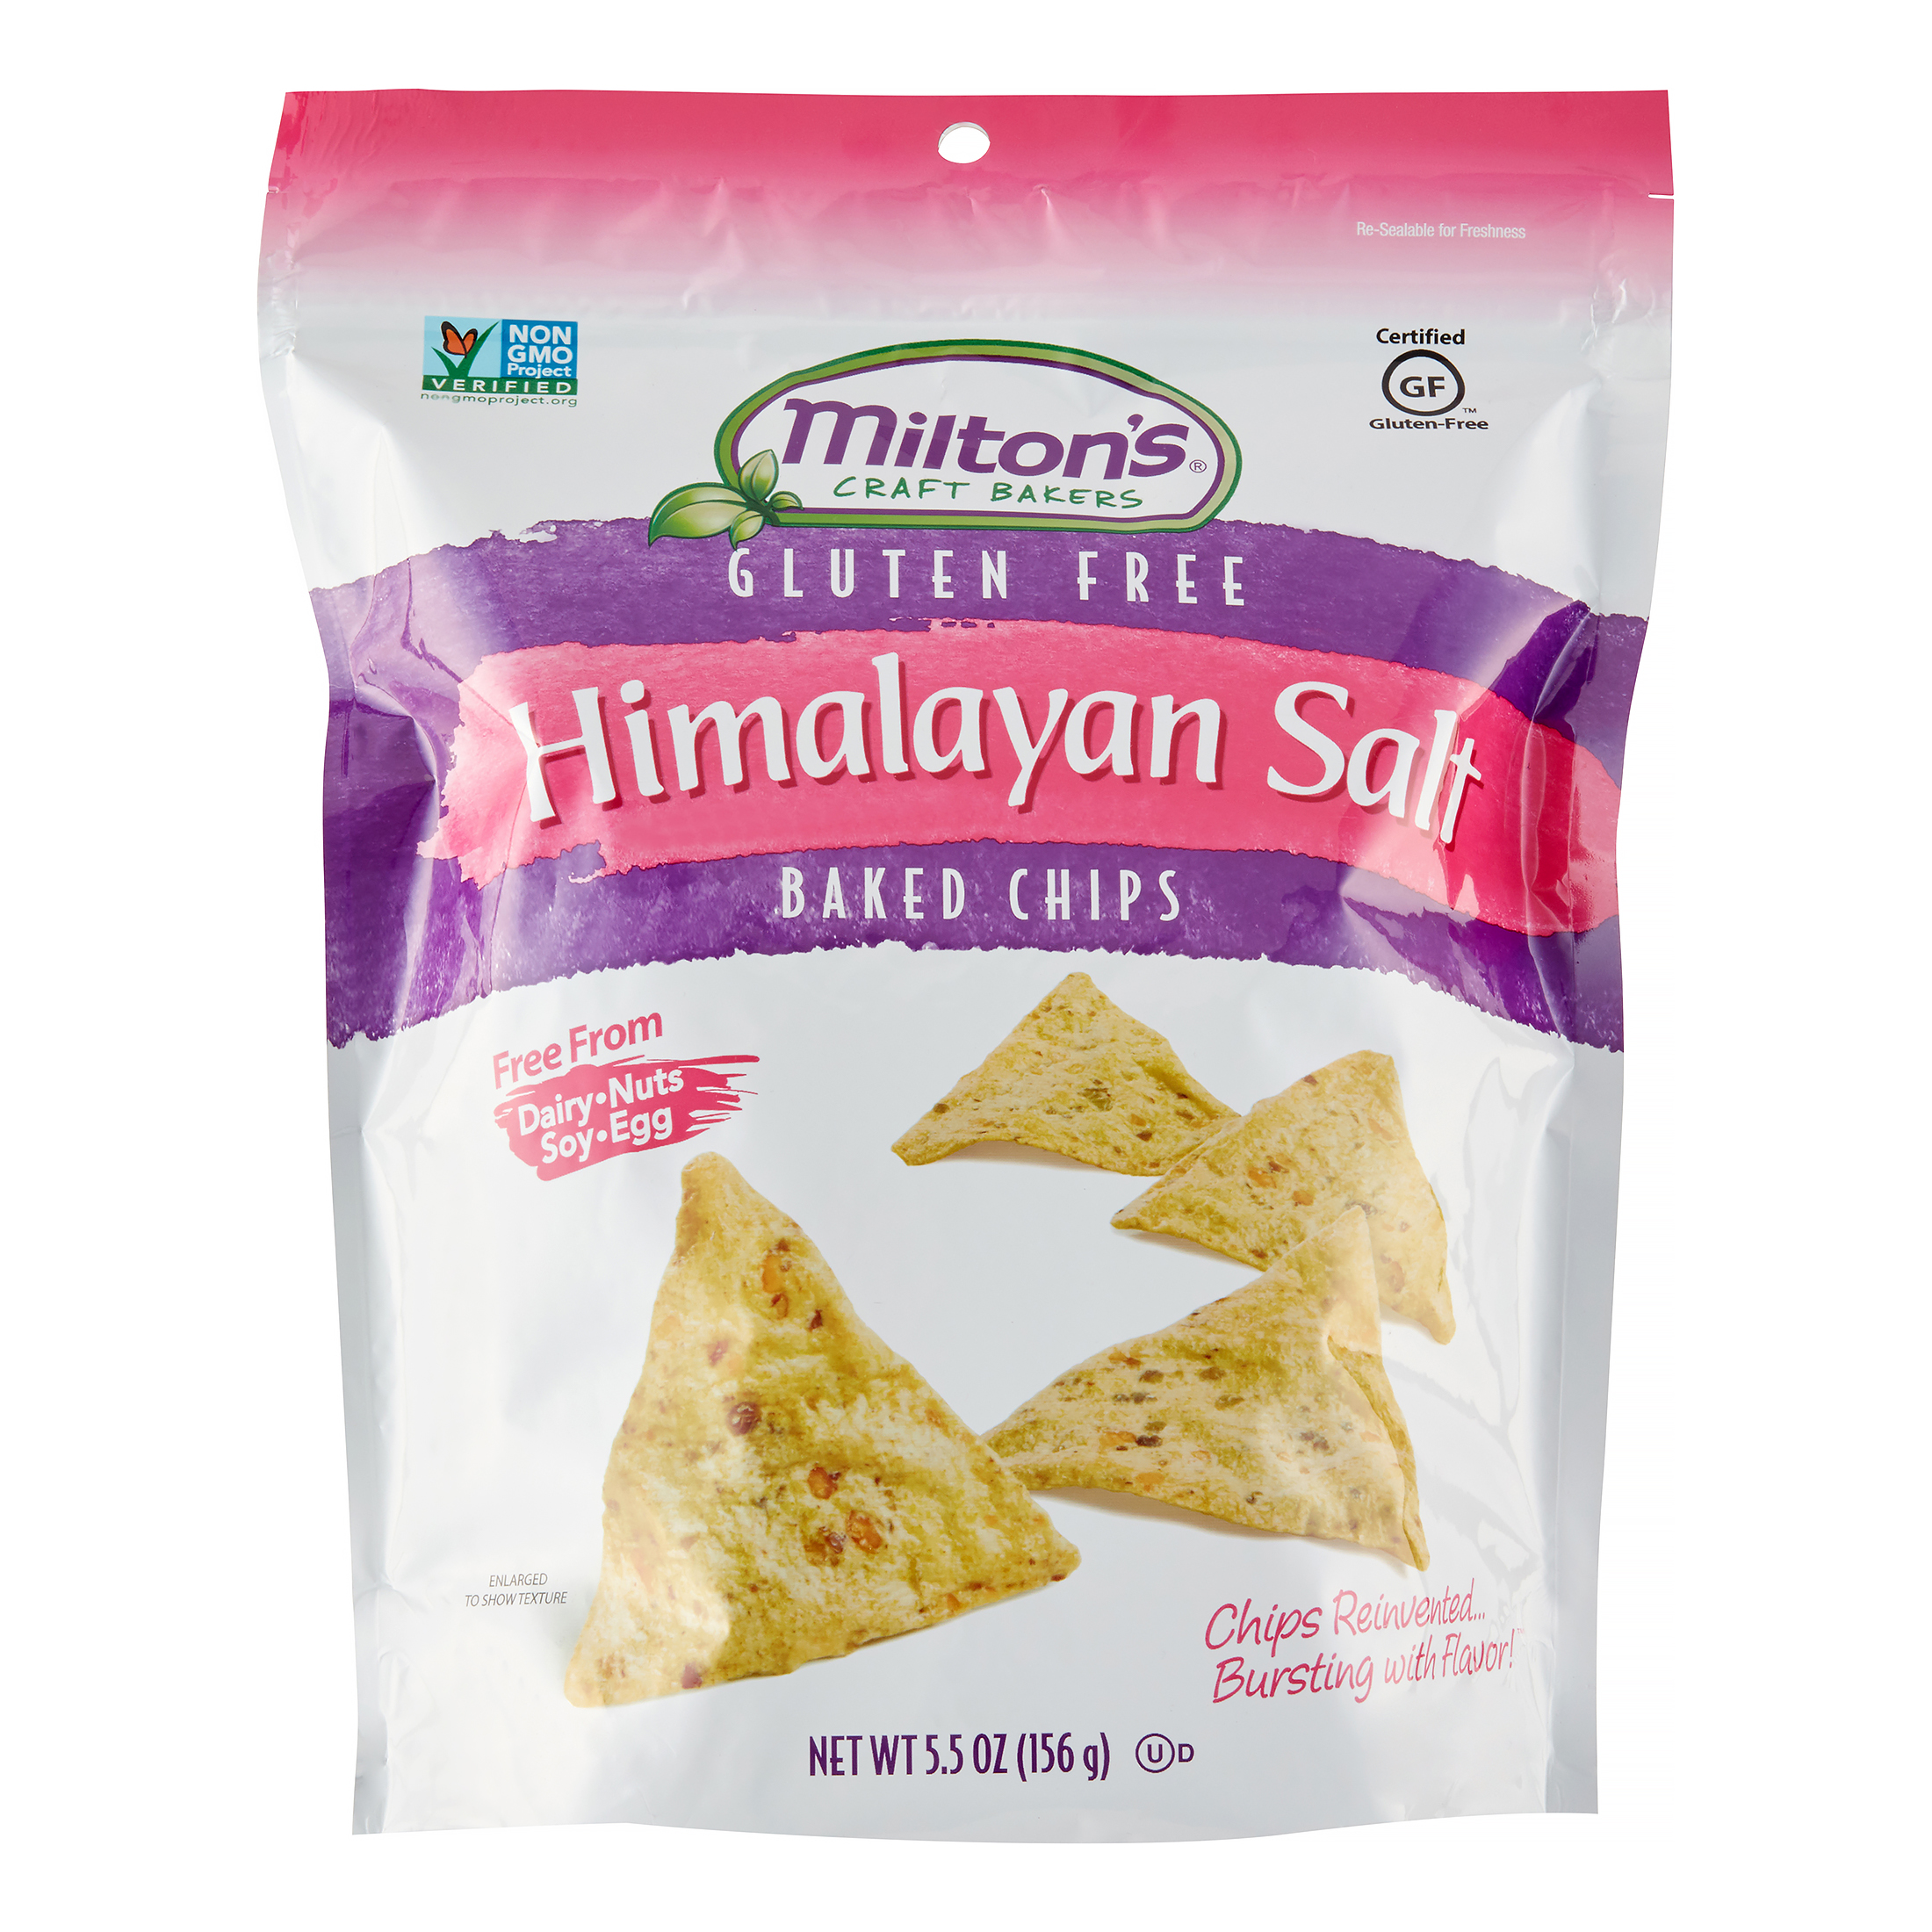 Milton's Gluten Free Himalayan Salt Baked Chips, 5.5 Oz